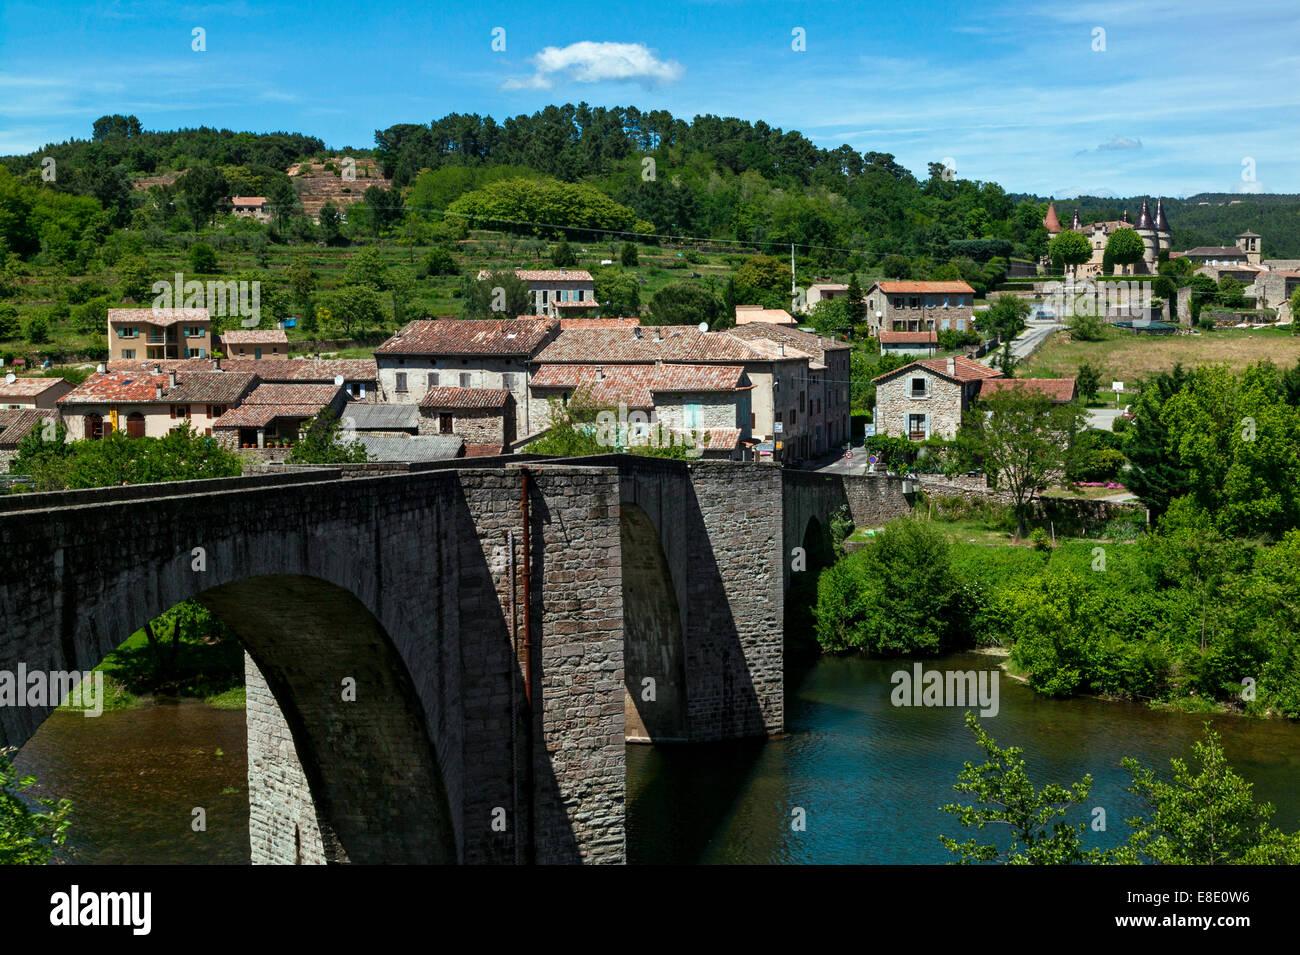 Chandolas, Ardeche,Rhone Alpes,France - Stock Image